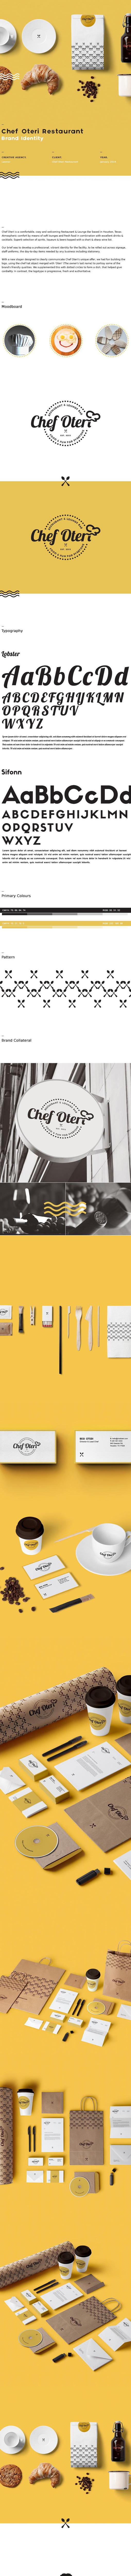 identity,pattern,guideline,logo,chef,Food ,cook,restaurant,stationary,kitchen,business,brand identity,shape,world,Coffee